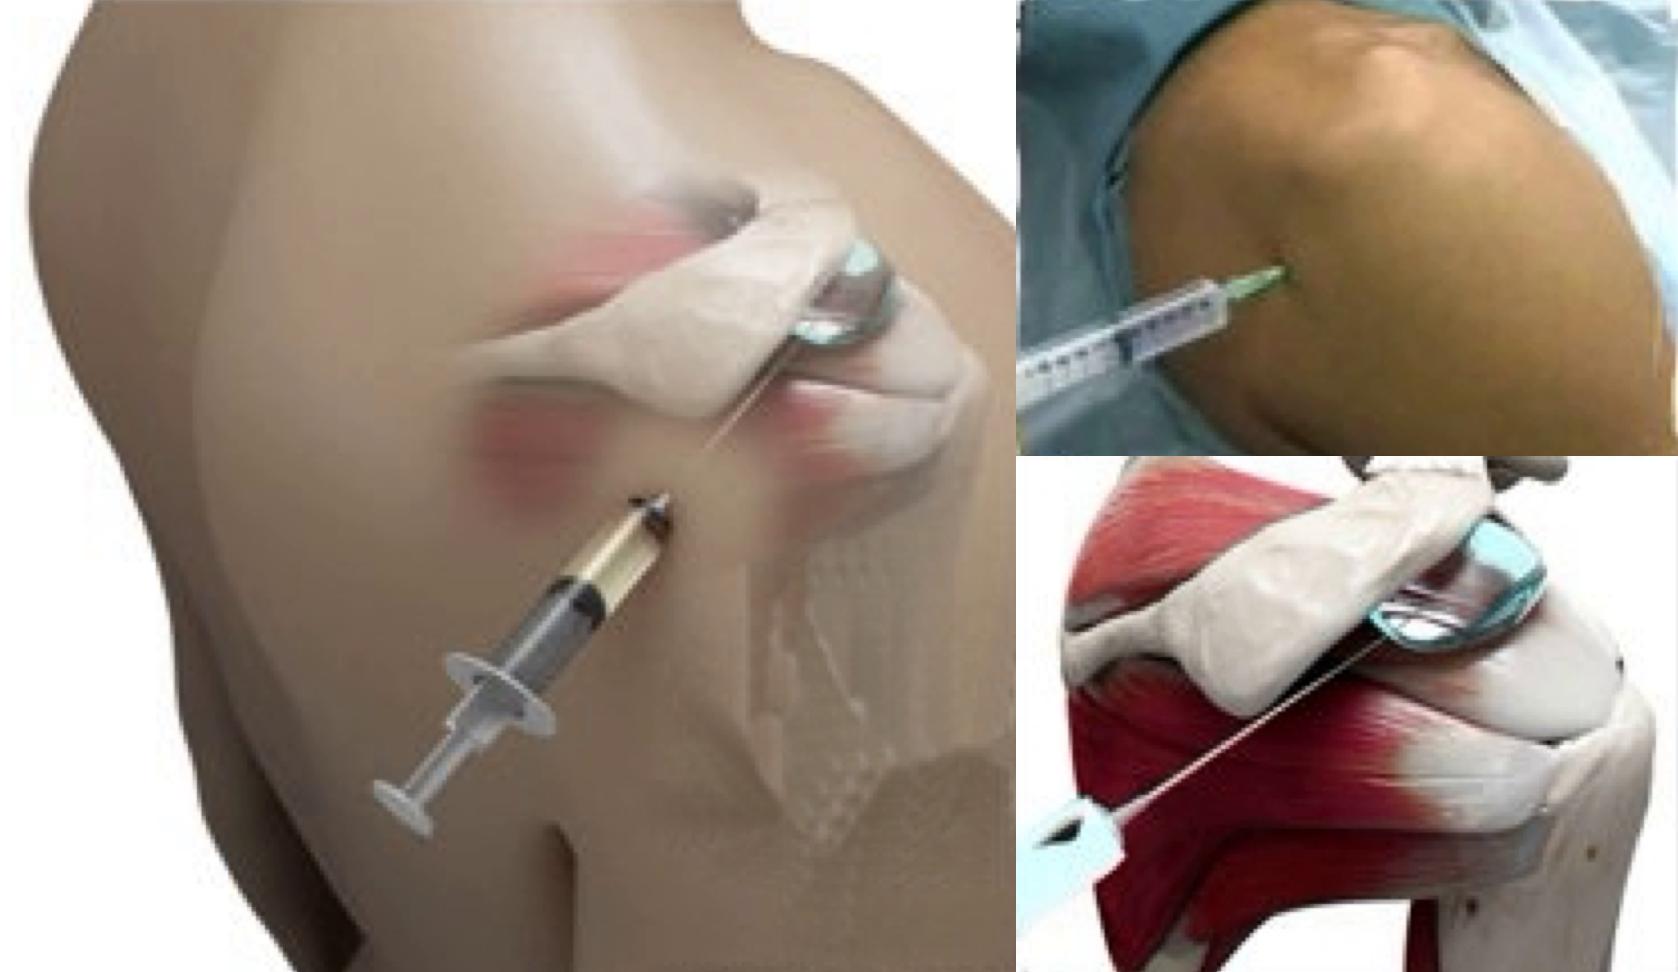 Rotator Cuff 3 - Supraspinatus Tendonitis - Treatment